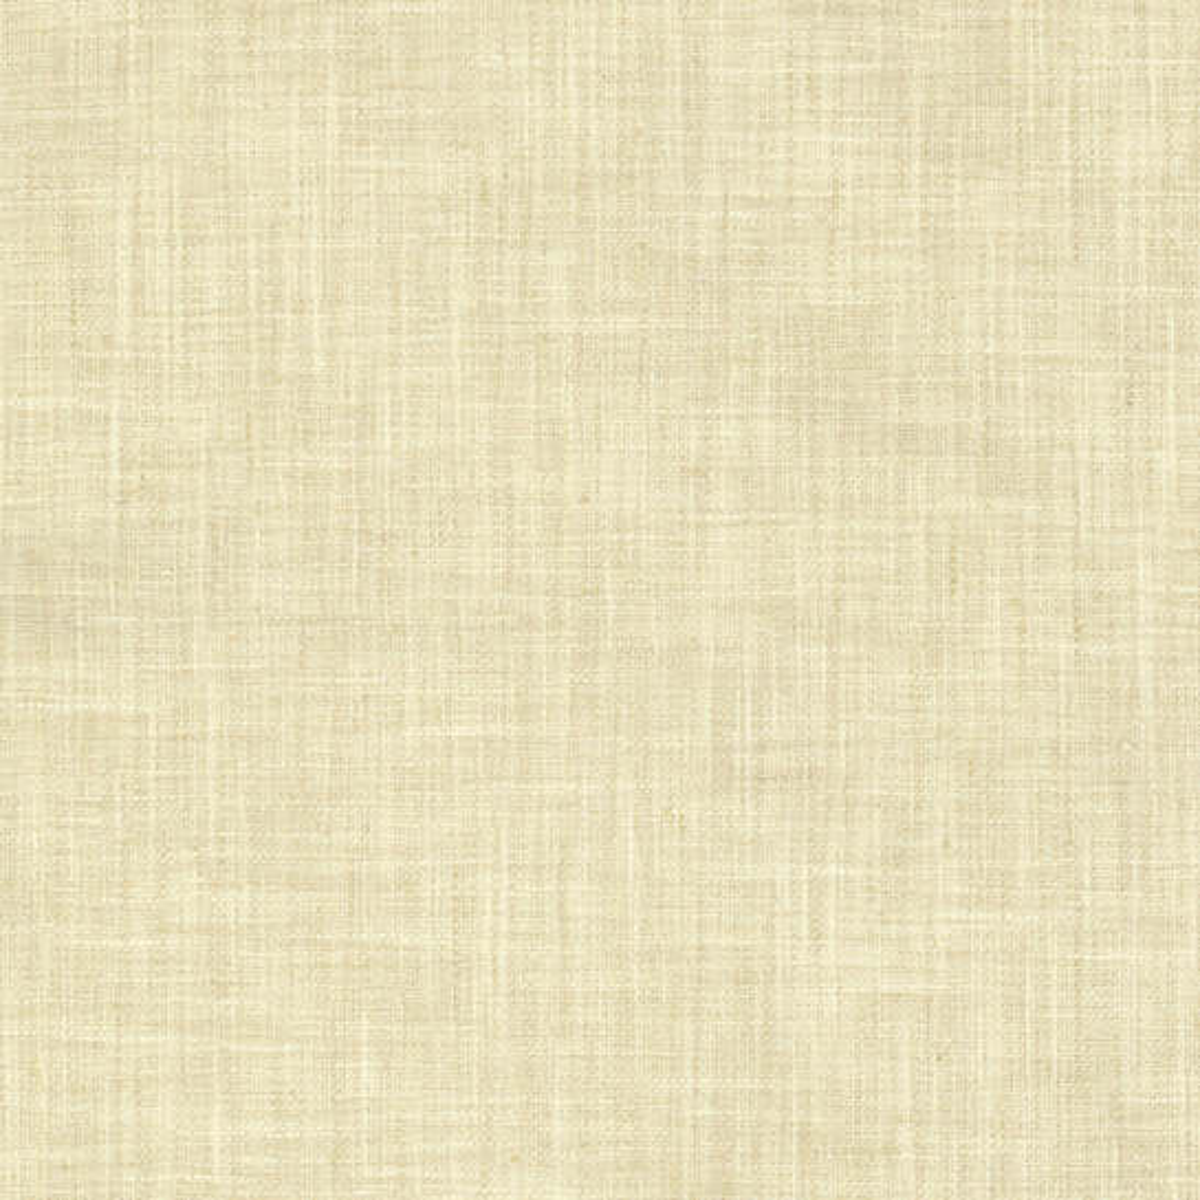 Greylock Ivory Swatch